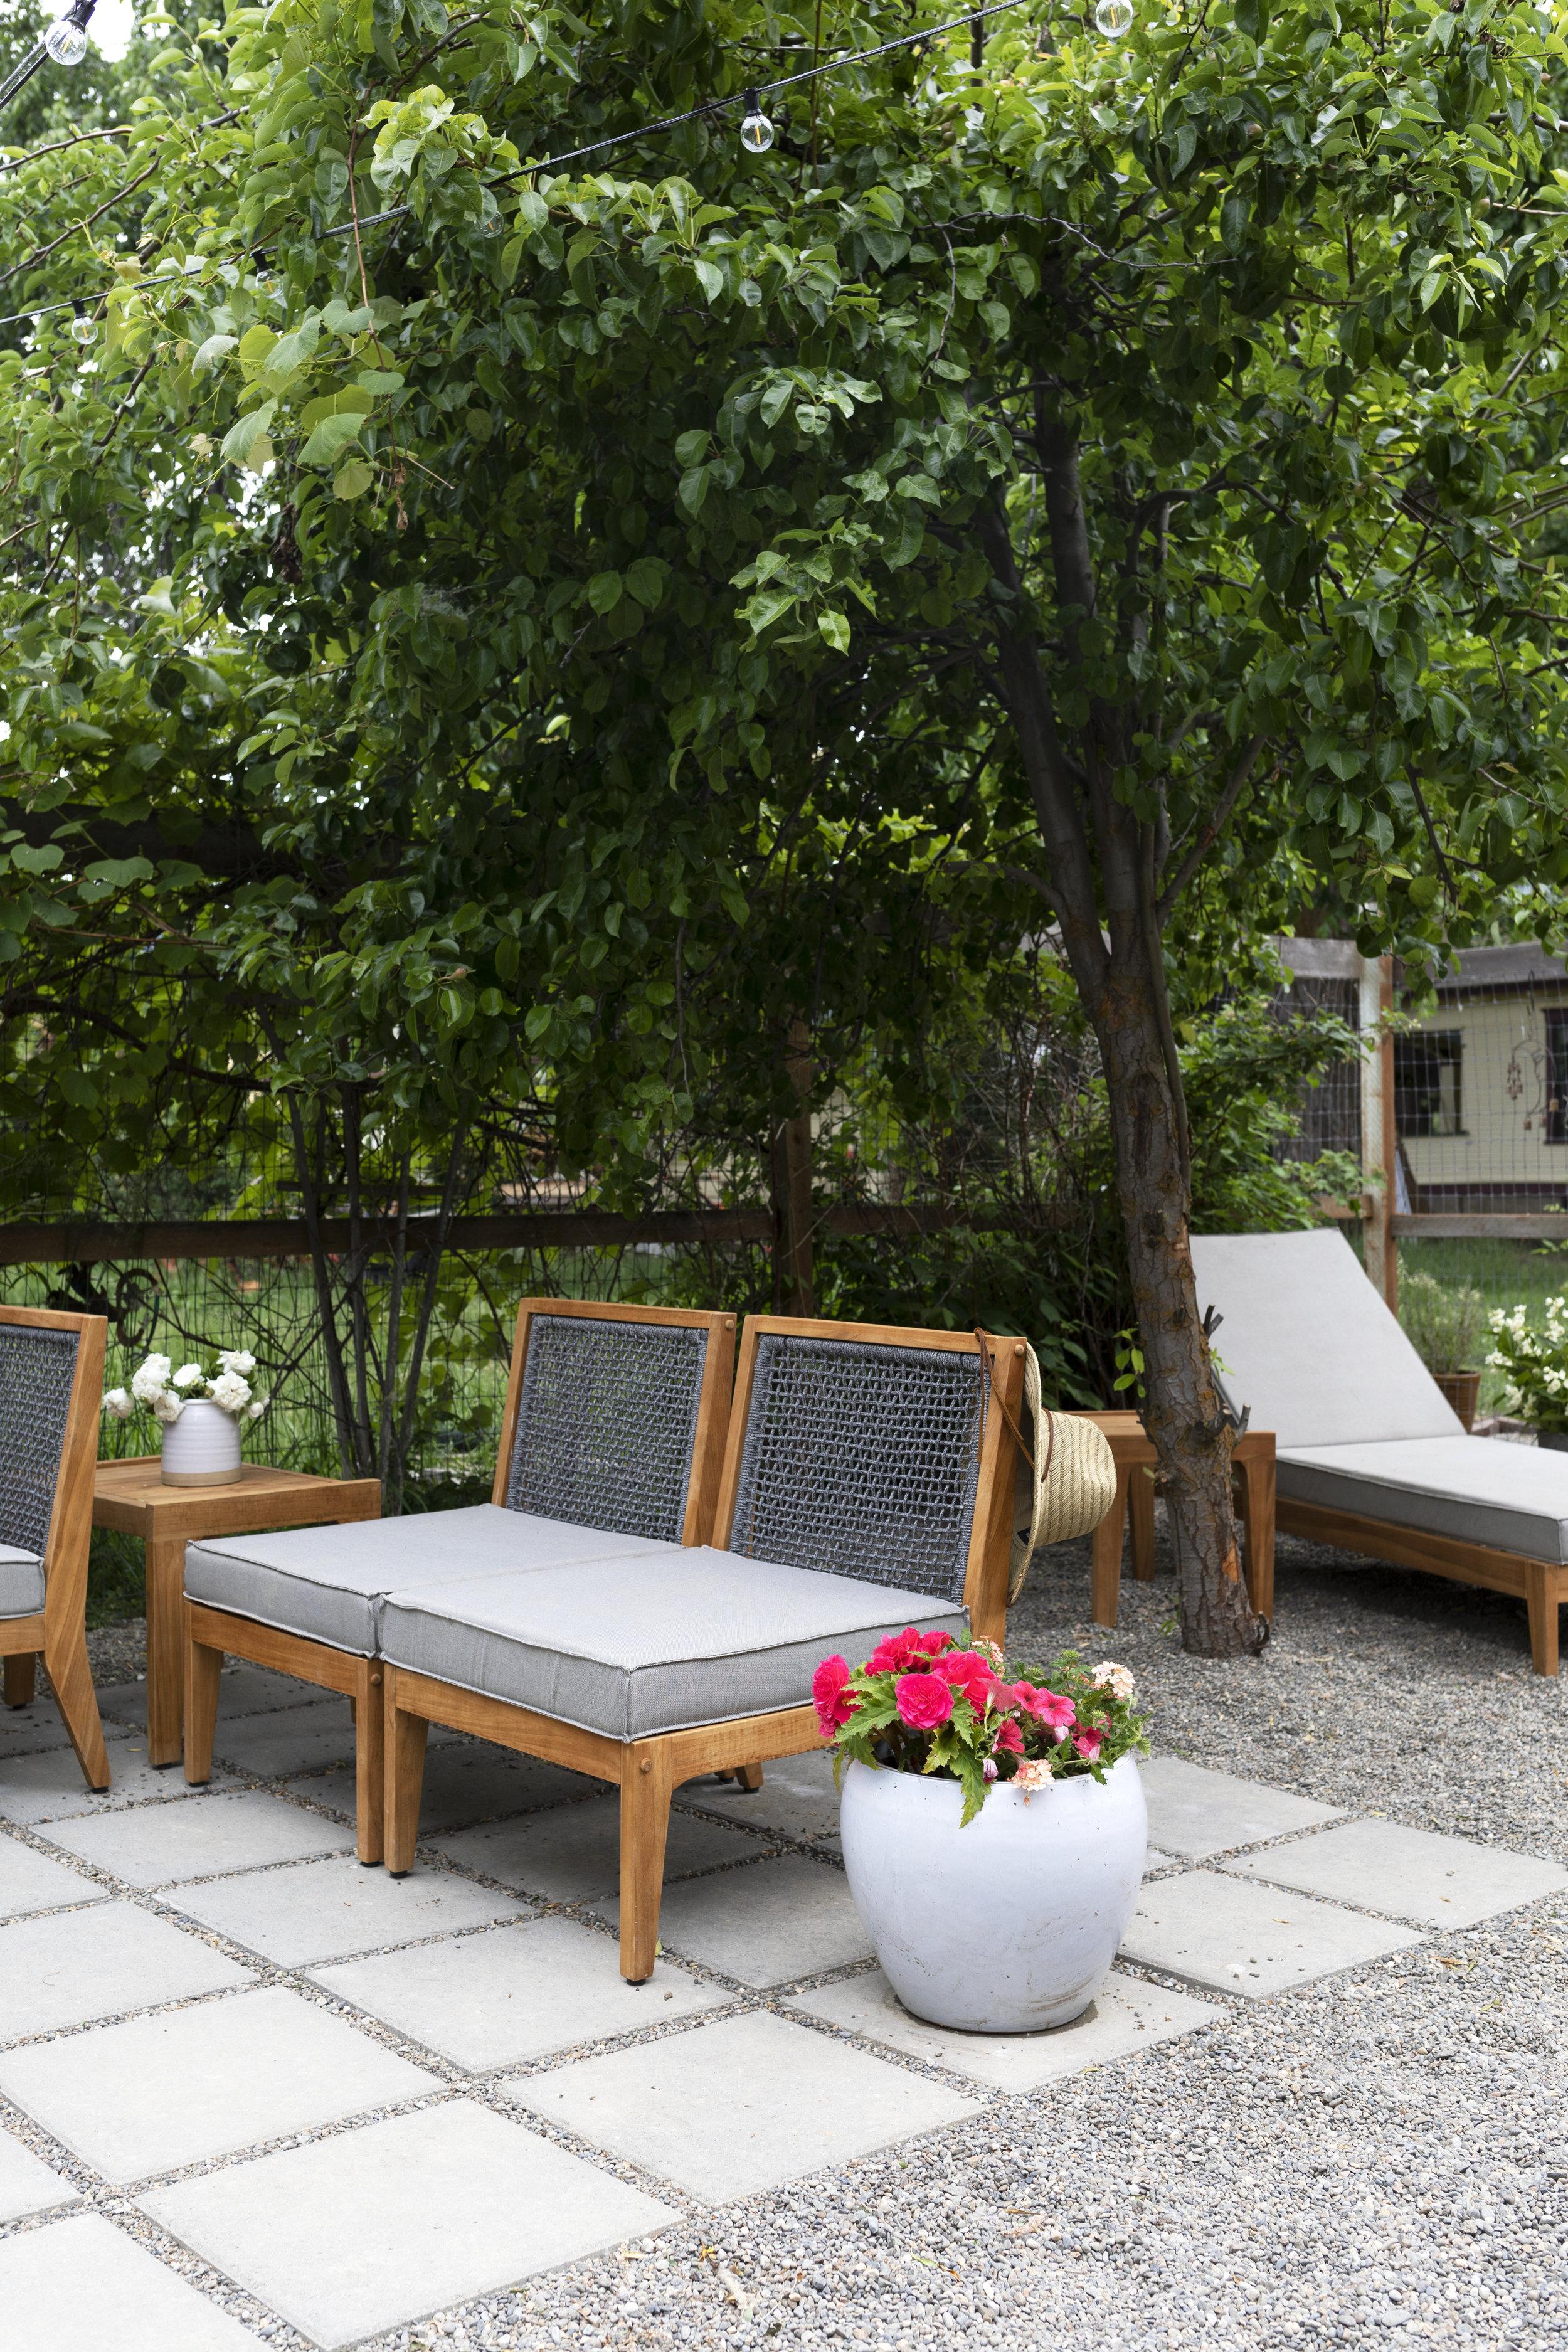 The Grit and Polish - Farmhouse Garden Patio Furniture 14.jpg